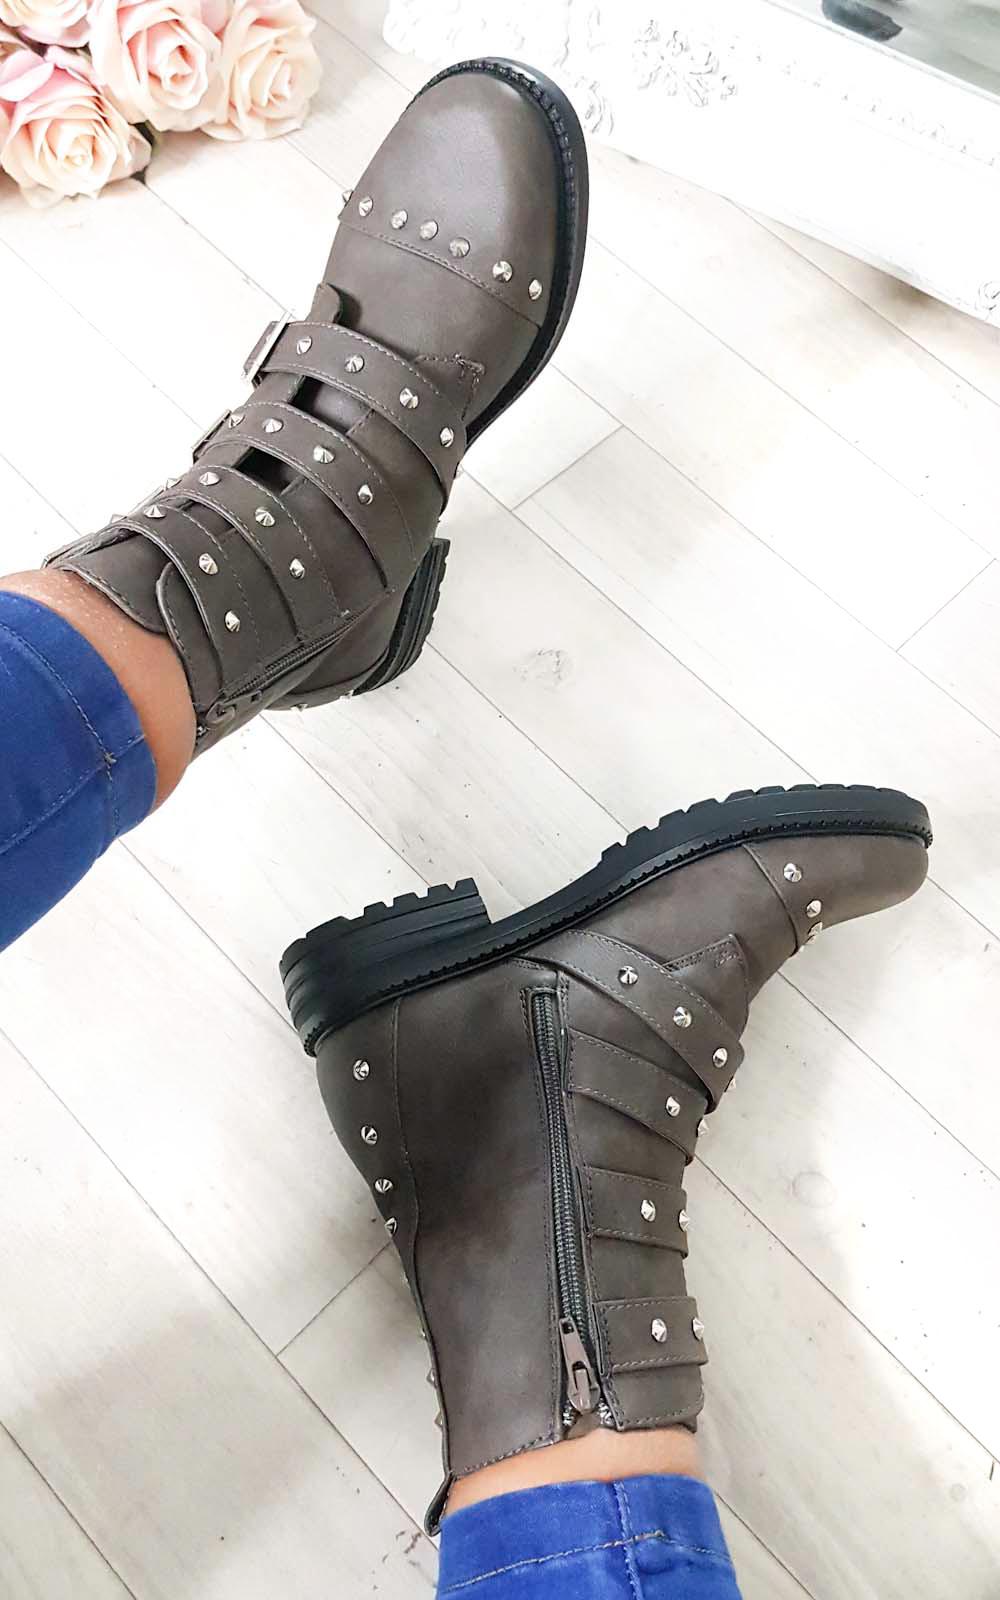 Brogan Studded Buckle Ankle Boots in Khaki